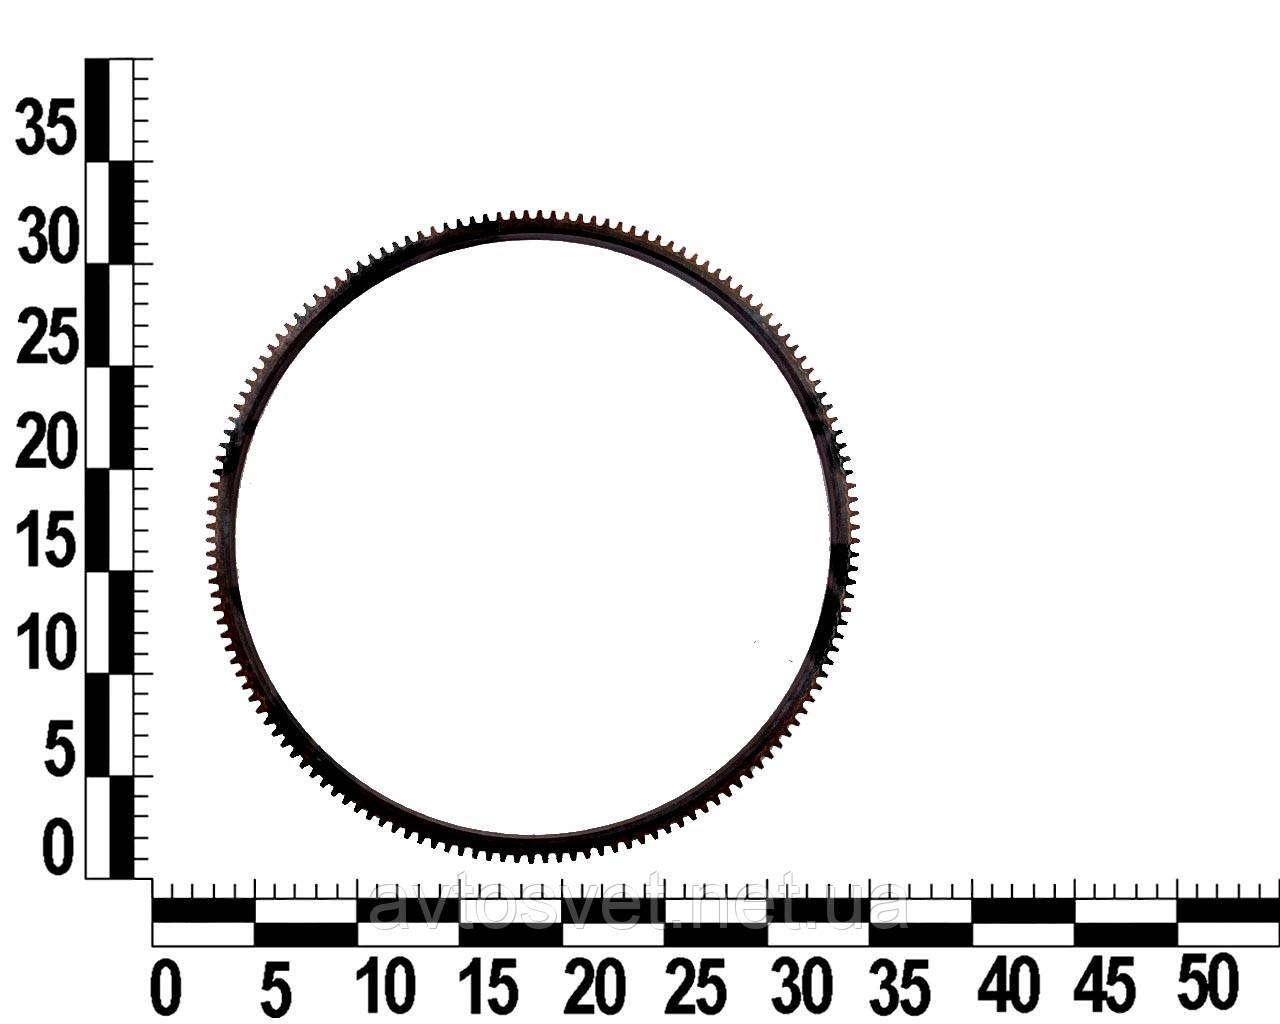 Обод маховика зубчатый (венец) Газель,Волга дв.406,405 (пр-во ЗМЗ) 406.1005125